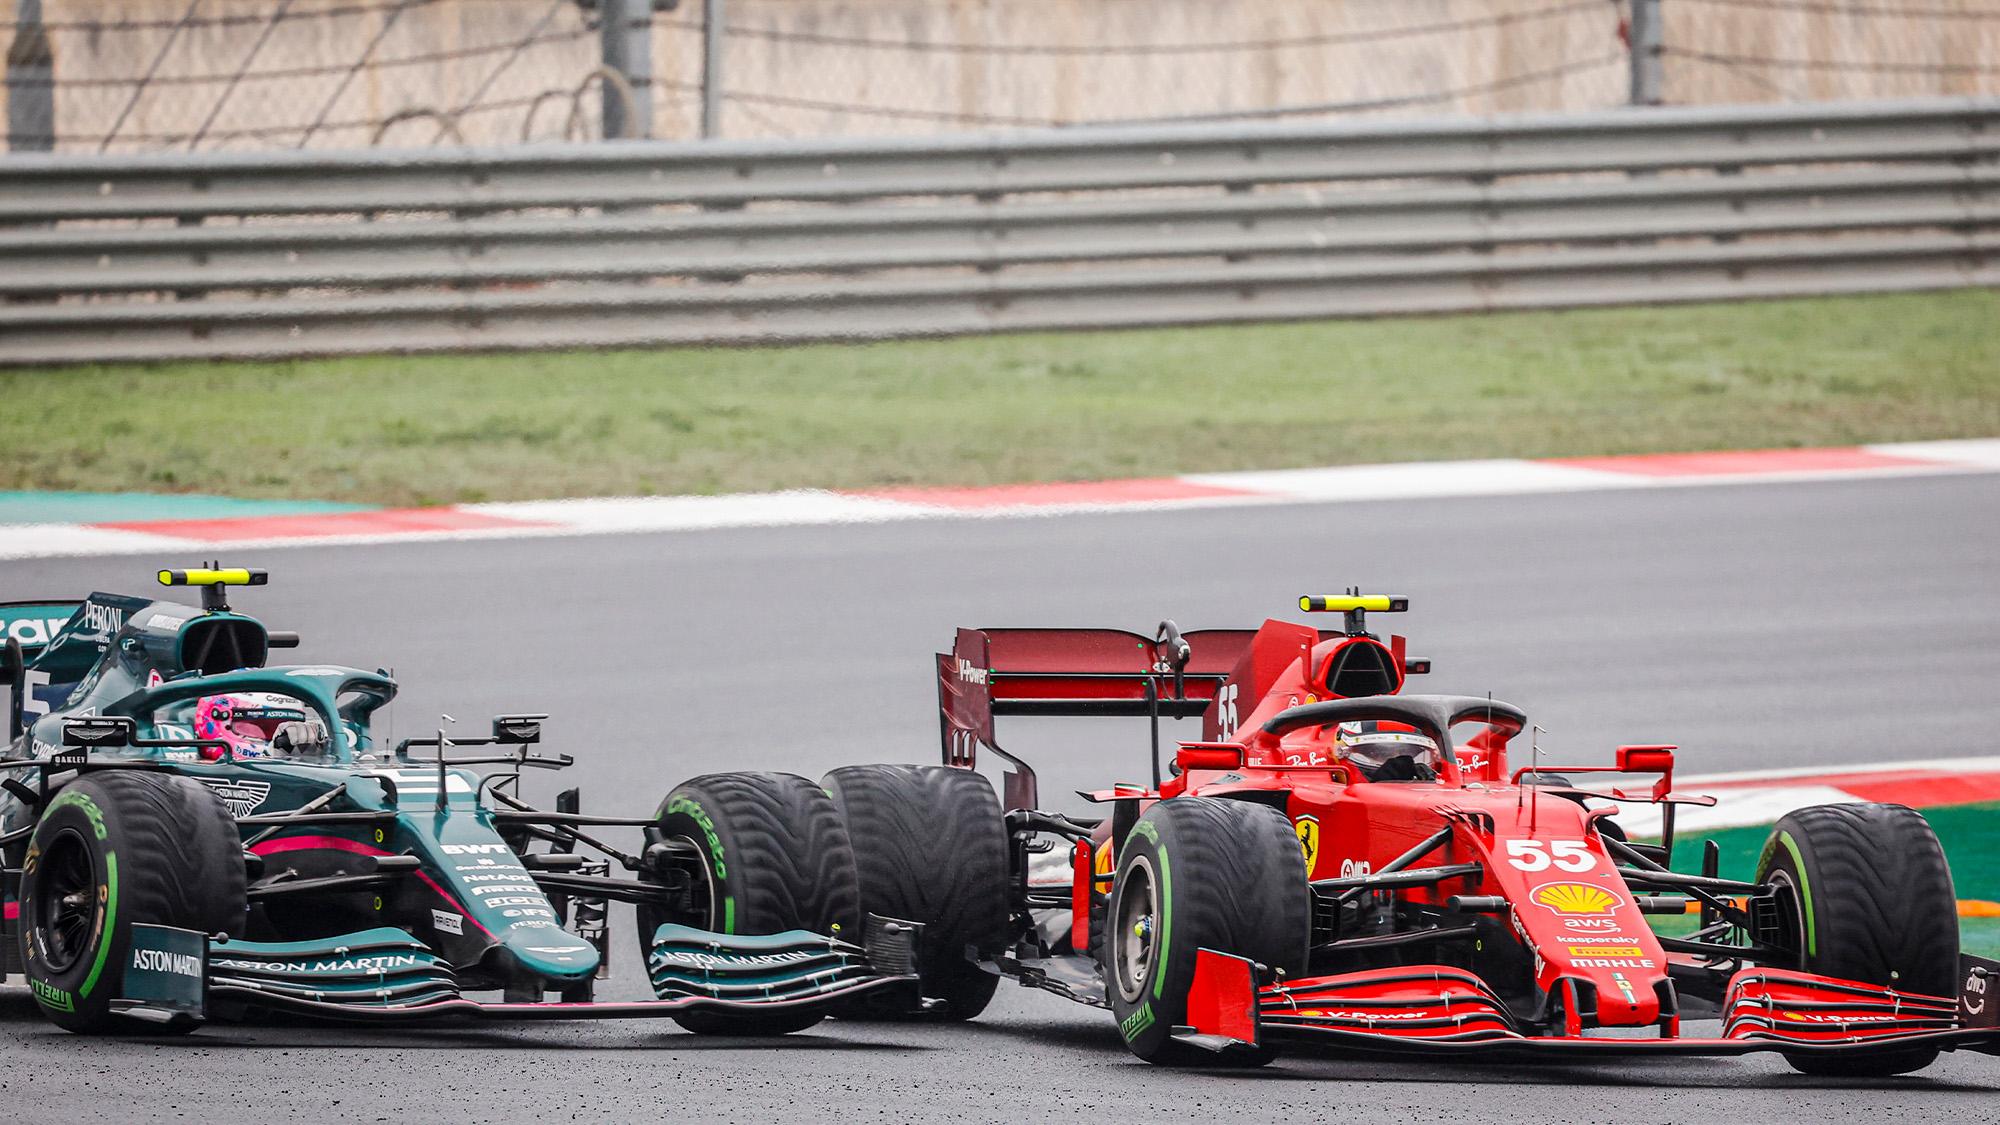 Sebastian Vettel and Carlos Sainz collide at the 2021 Turkish Grand Prix